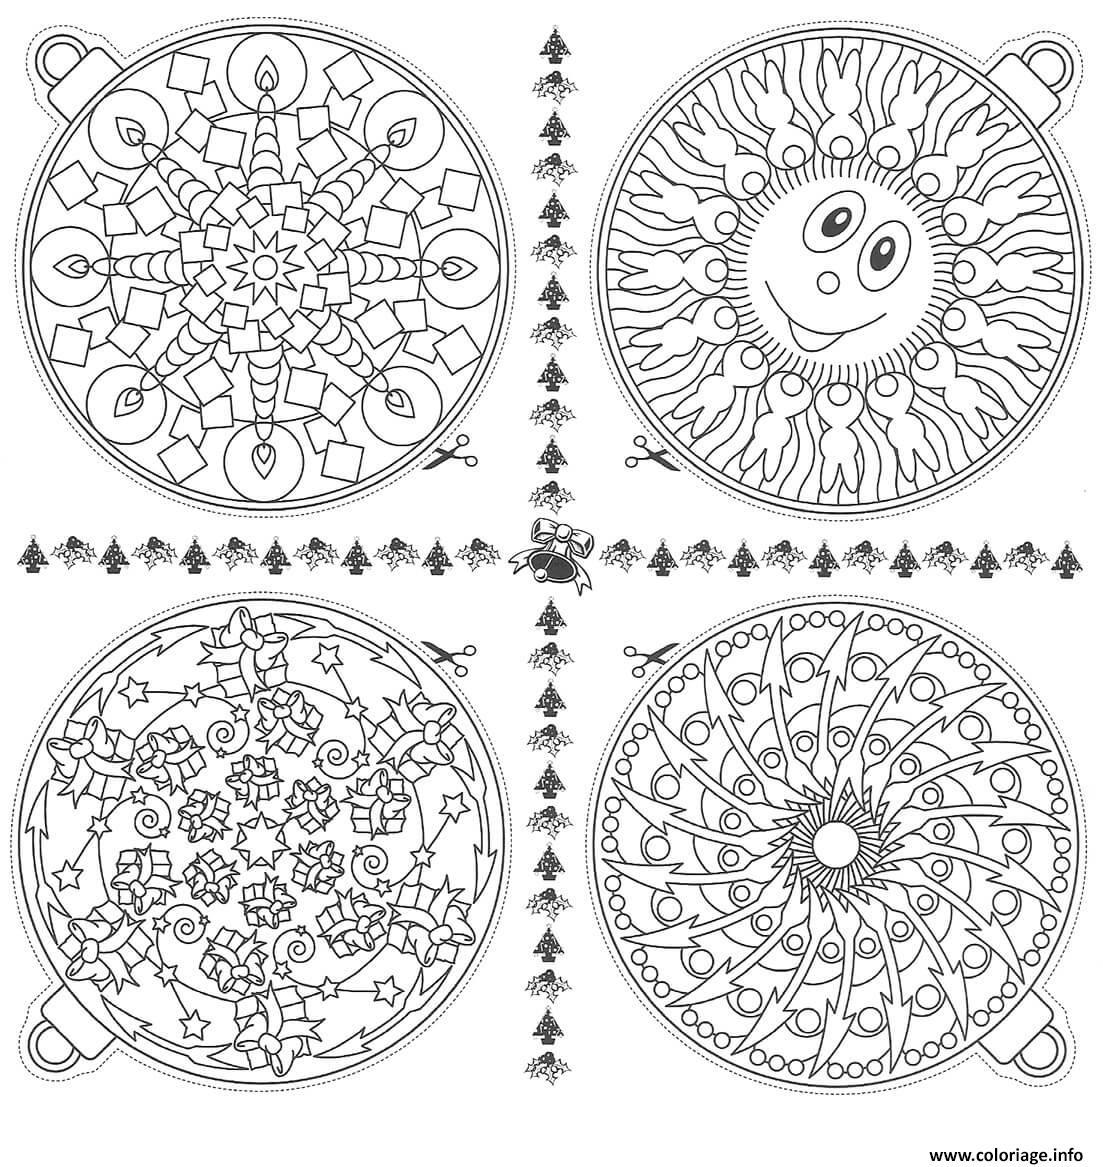 Coloriage boules de noel mandala dessin - Imprimer des mandalas gratuit ...